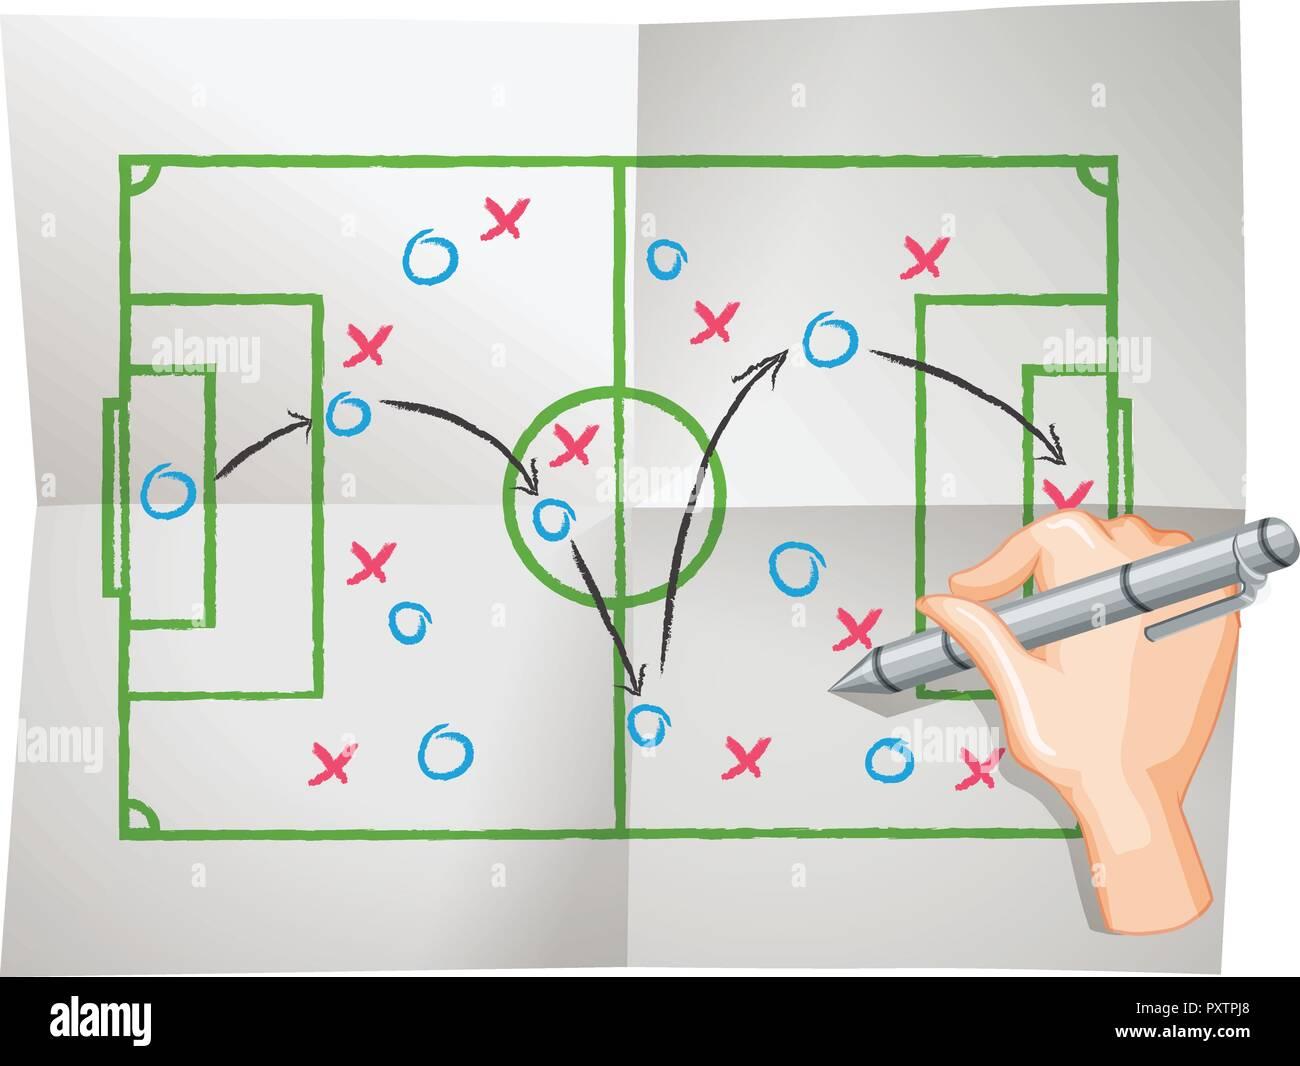 Game plan on draft paper illustration - Stock Vector